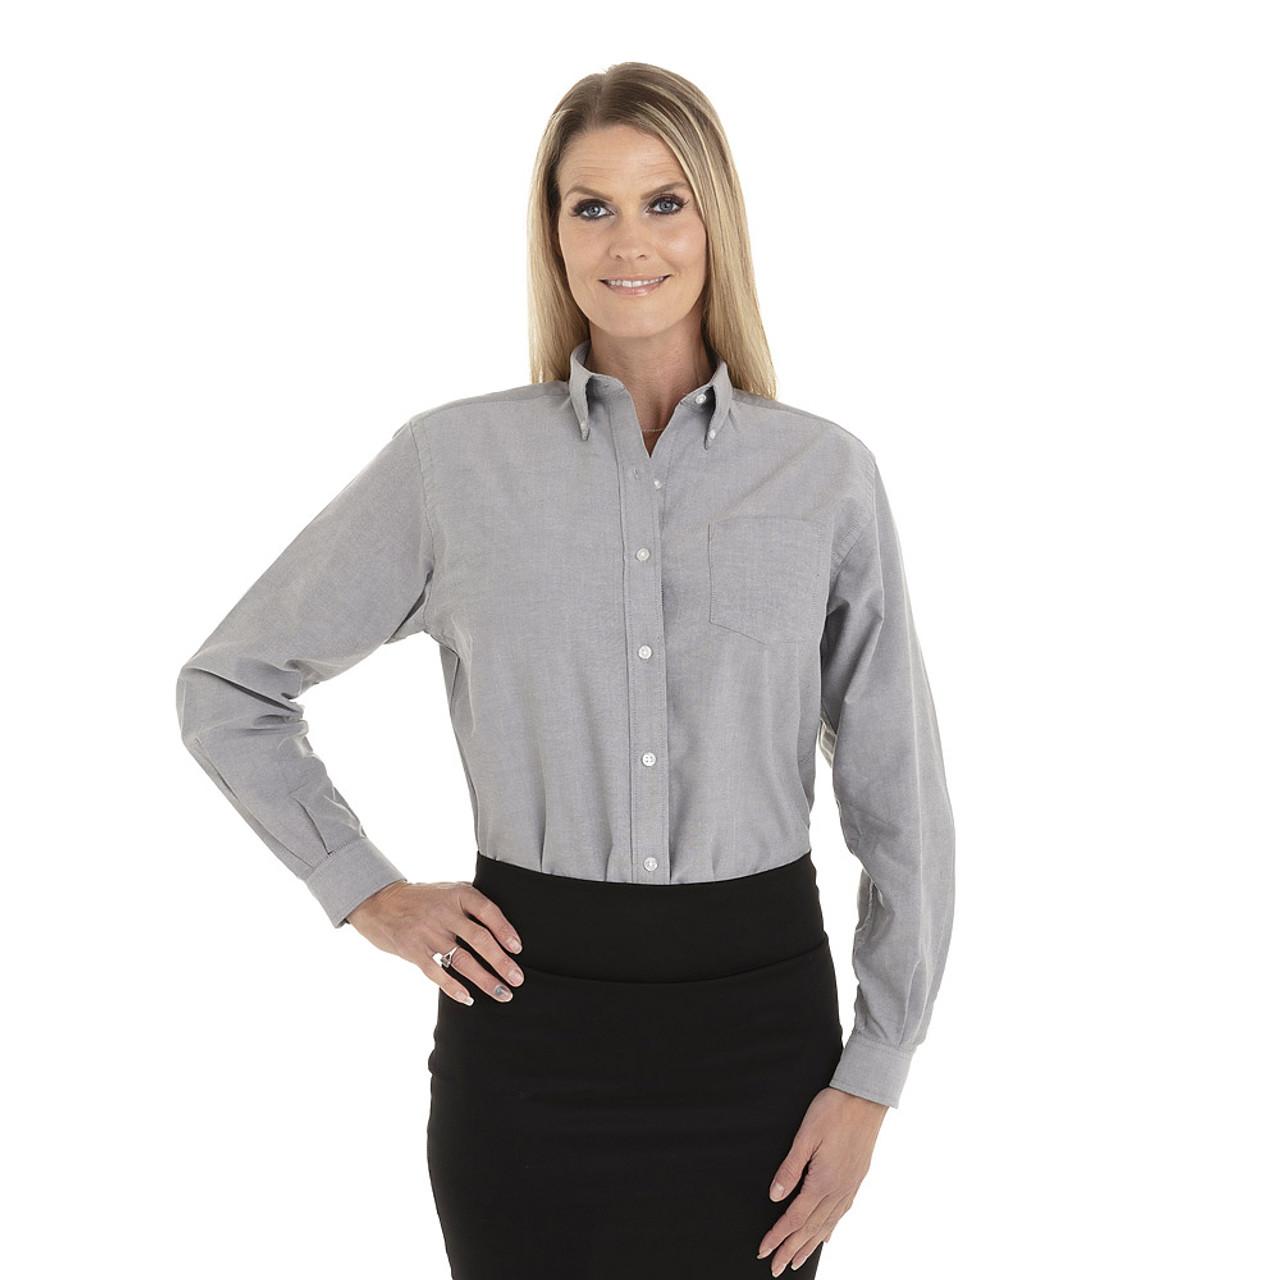 Greystone - 18CV300 Van Heusen Ladies' Long Sleeve Oxford Shirt | T-shirt.ca